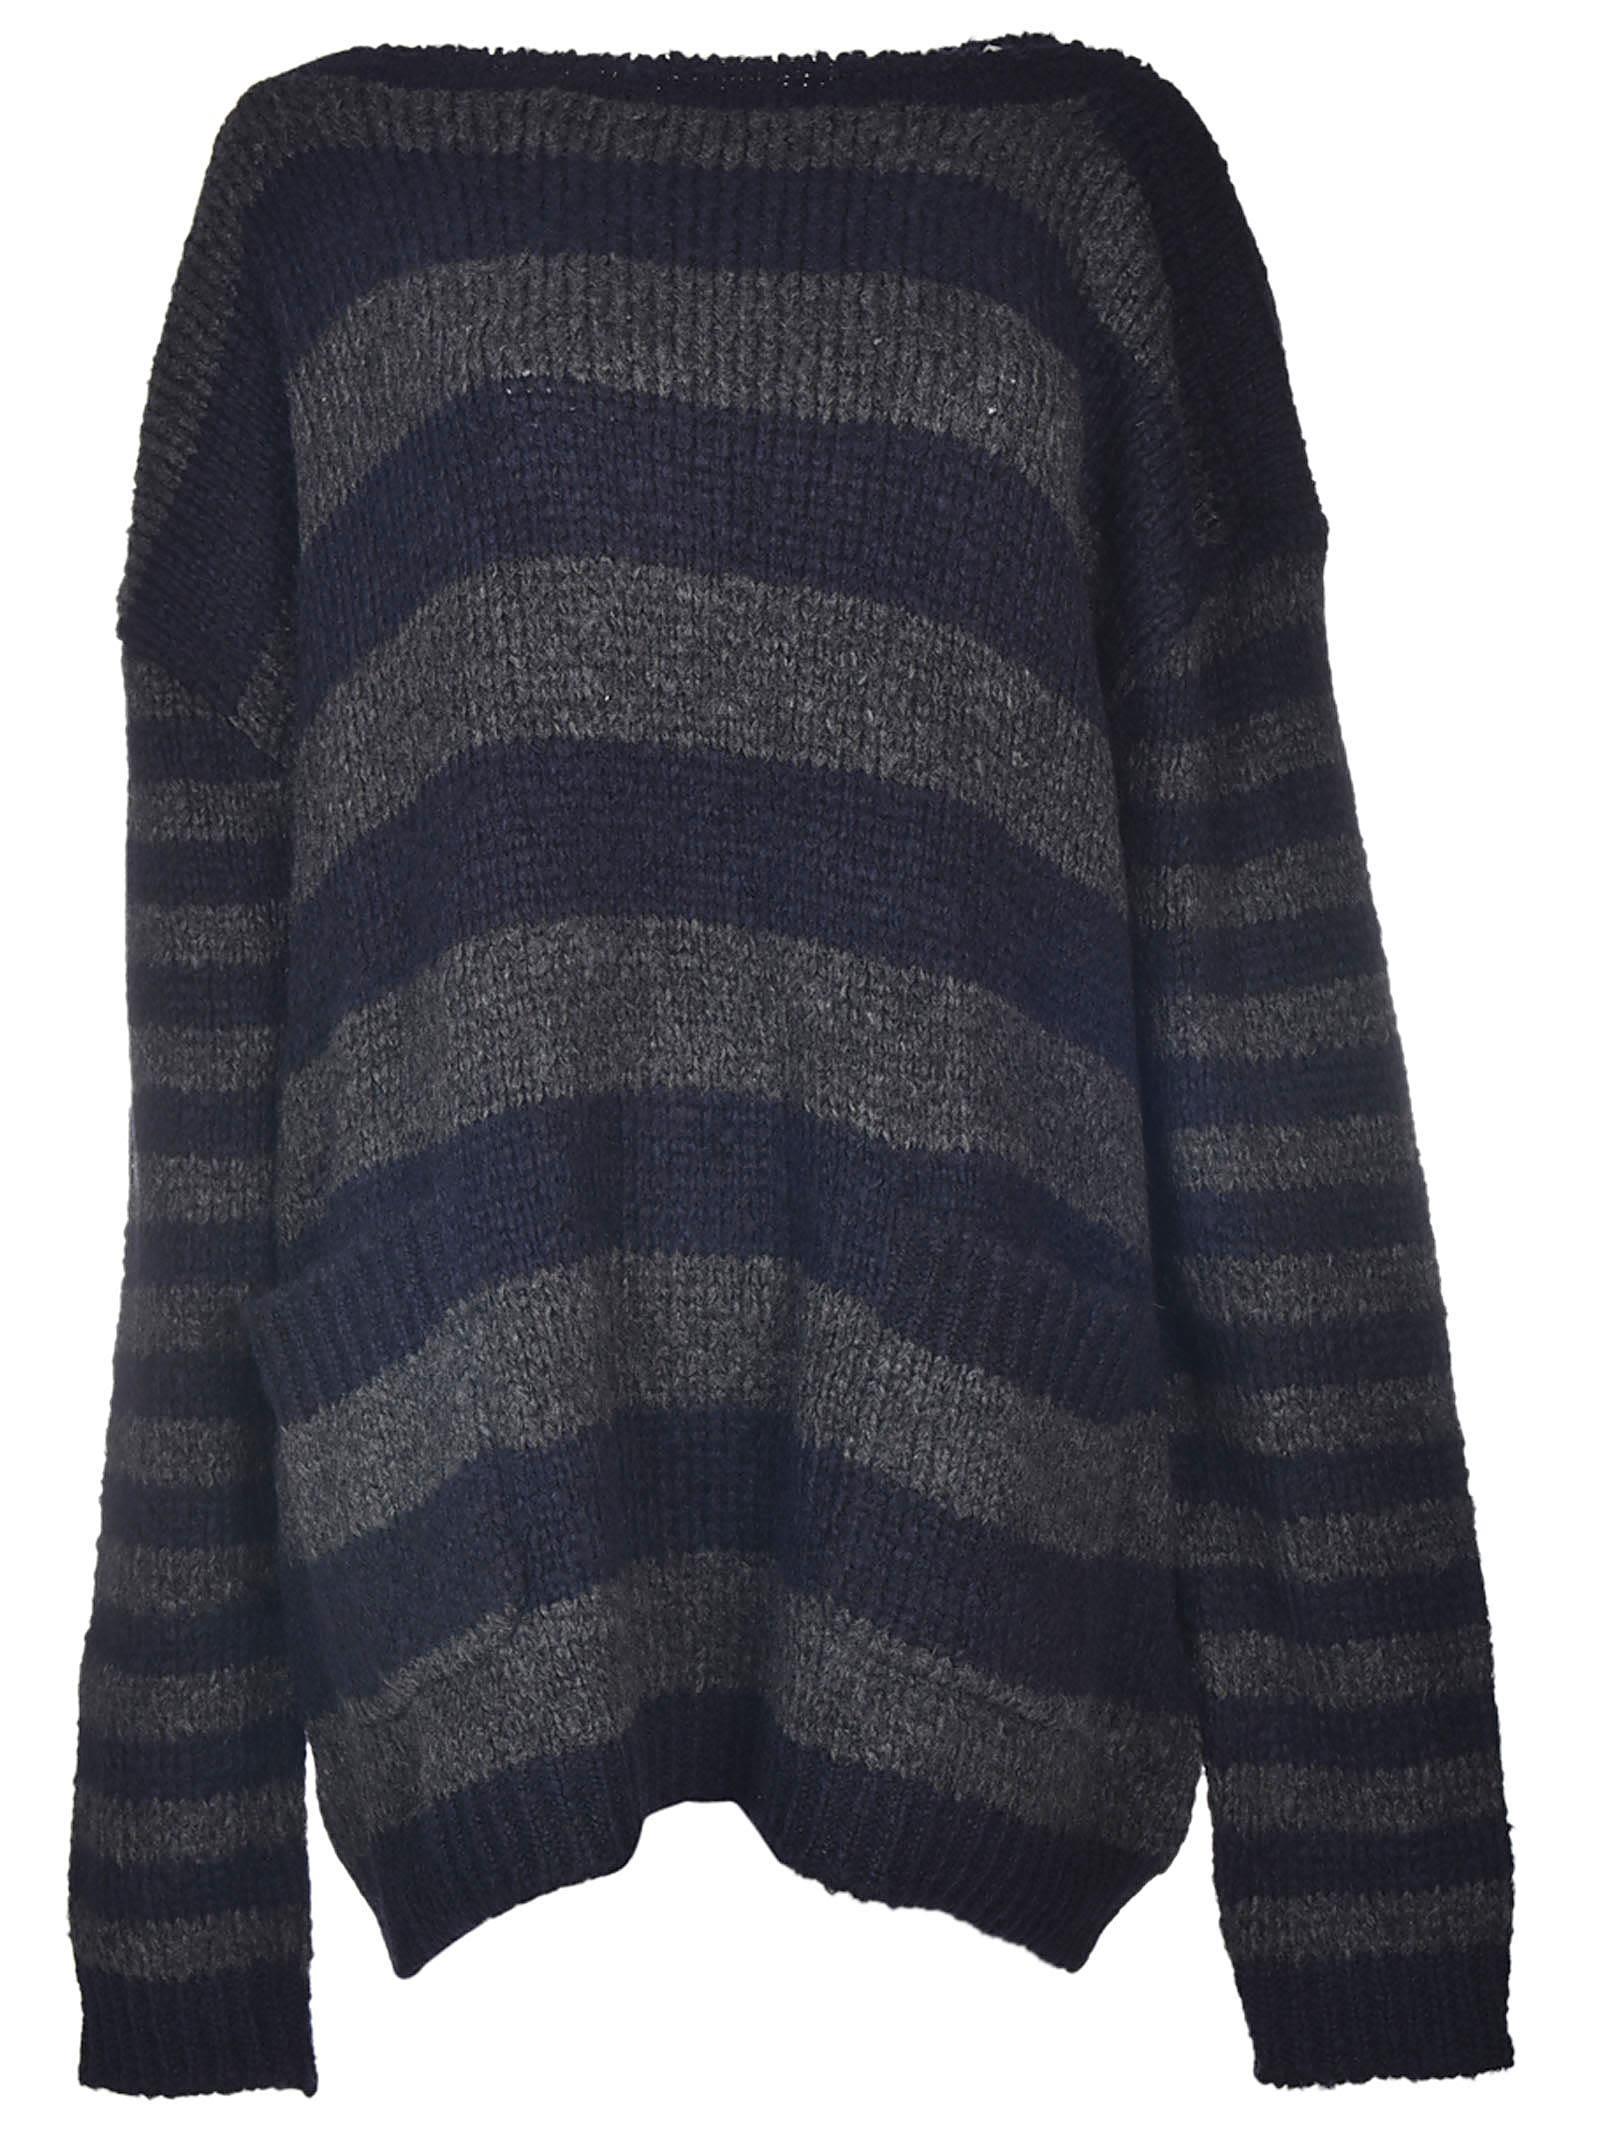 Faith Connexion Oversized Striped Sweater